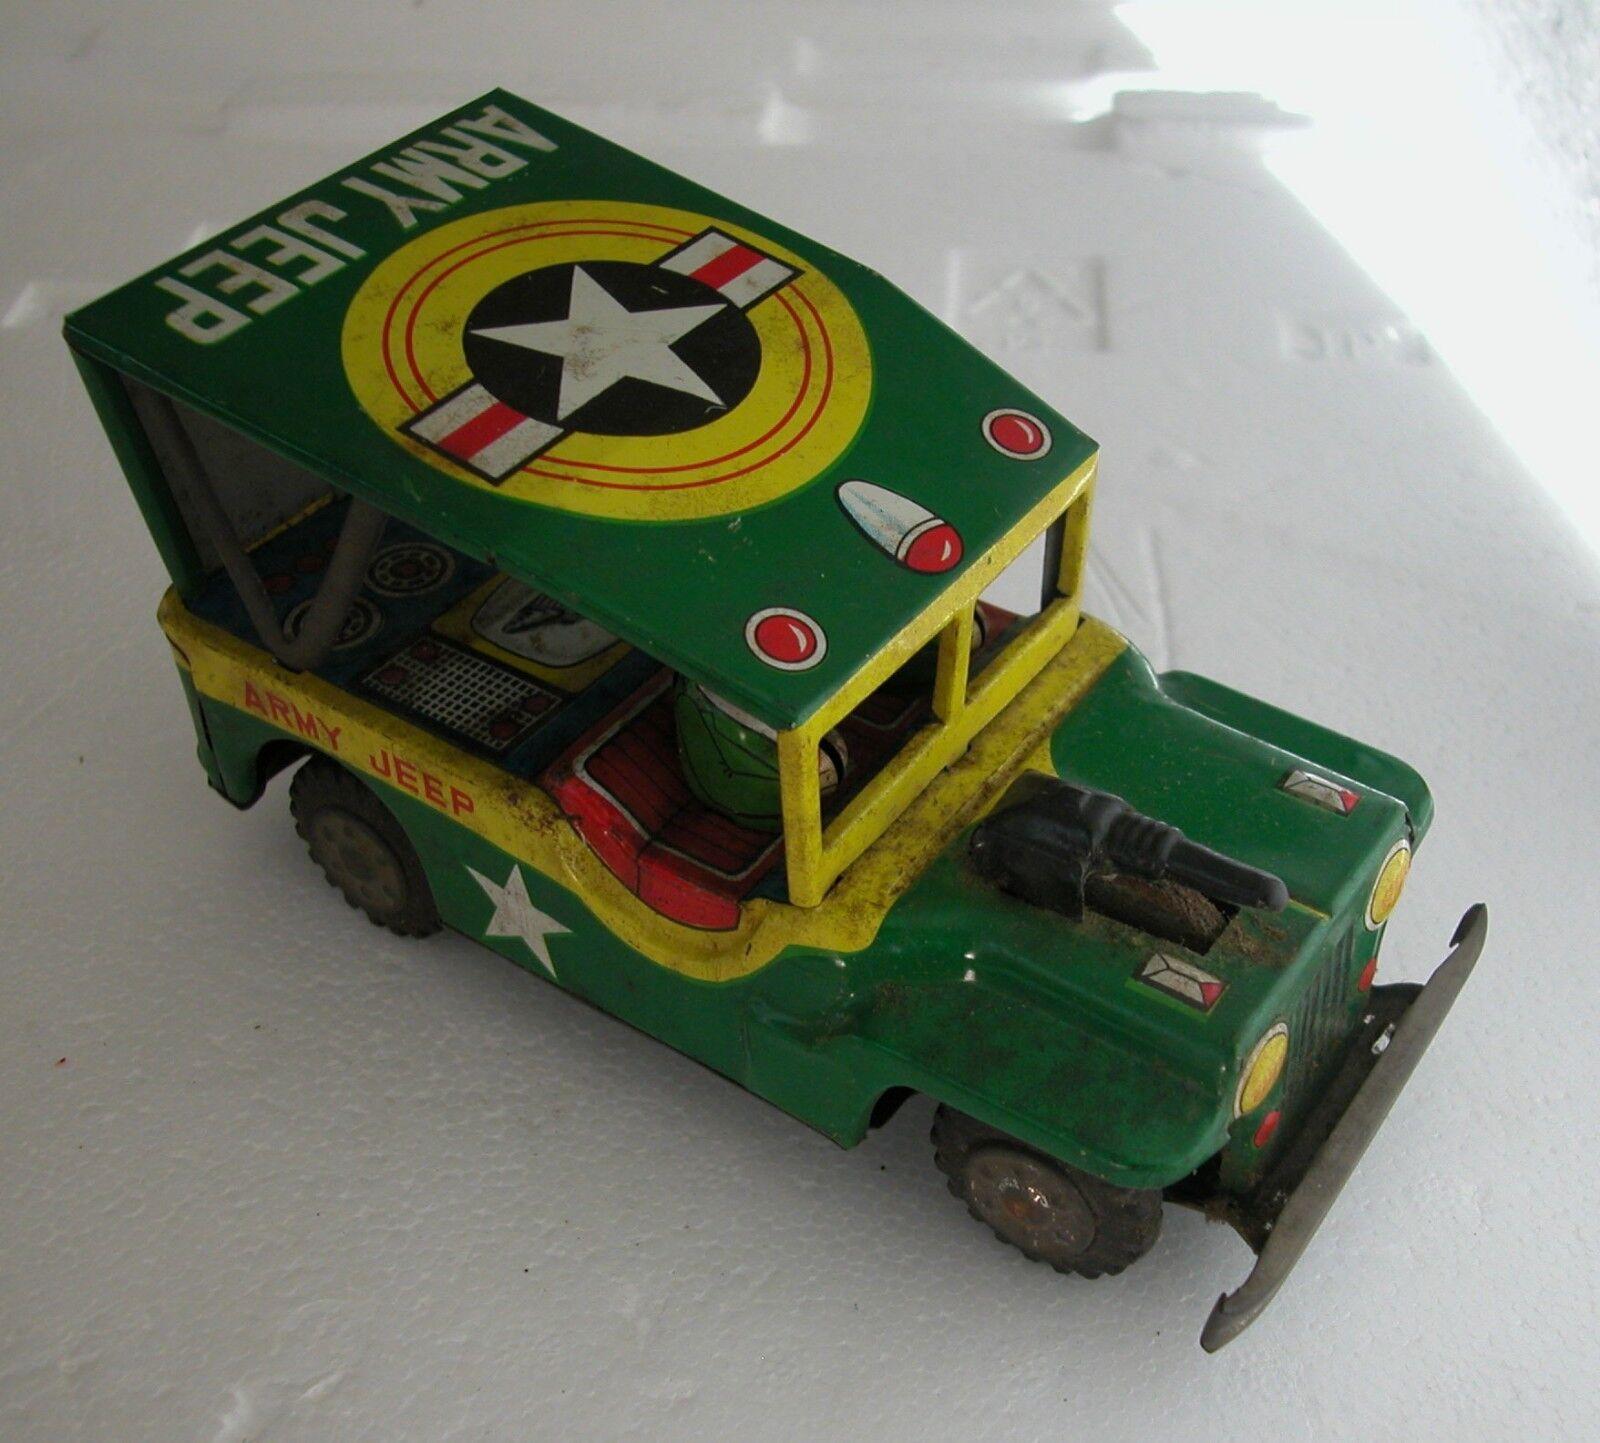 A Scarce Vintage 1950's Tin Friction Army Jeep Toy Produced By  Yonezawa Japan